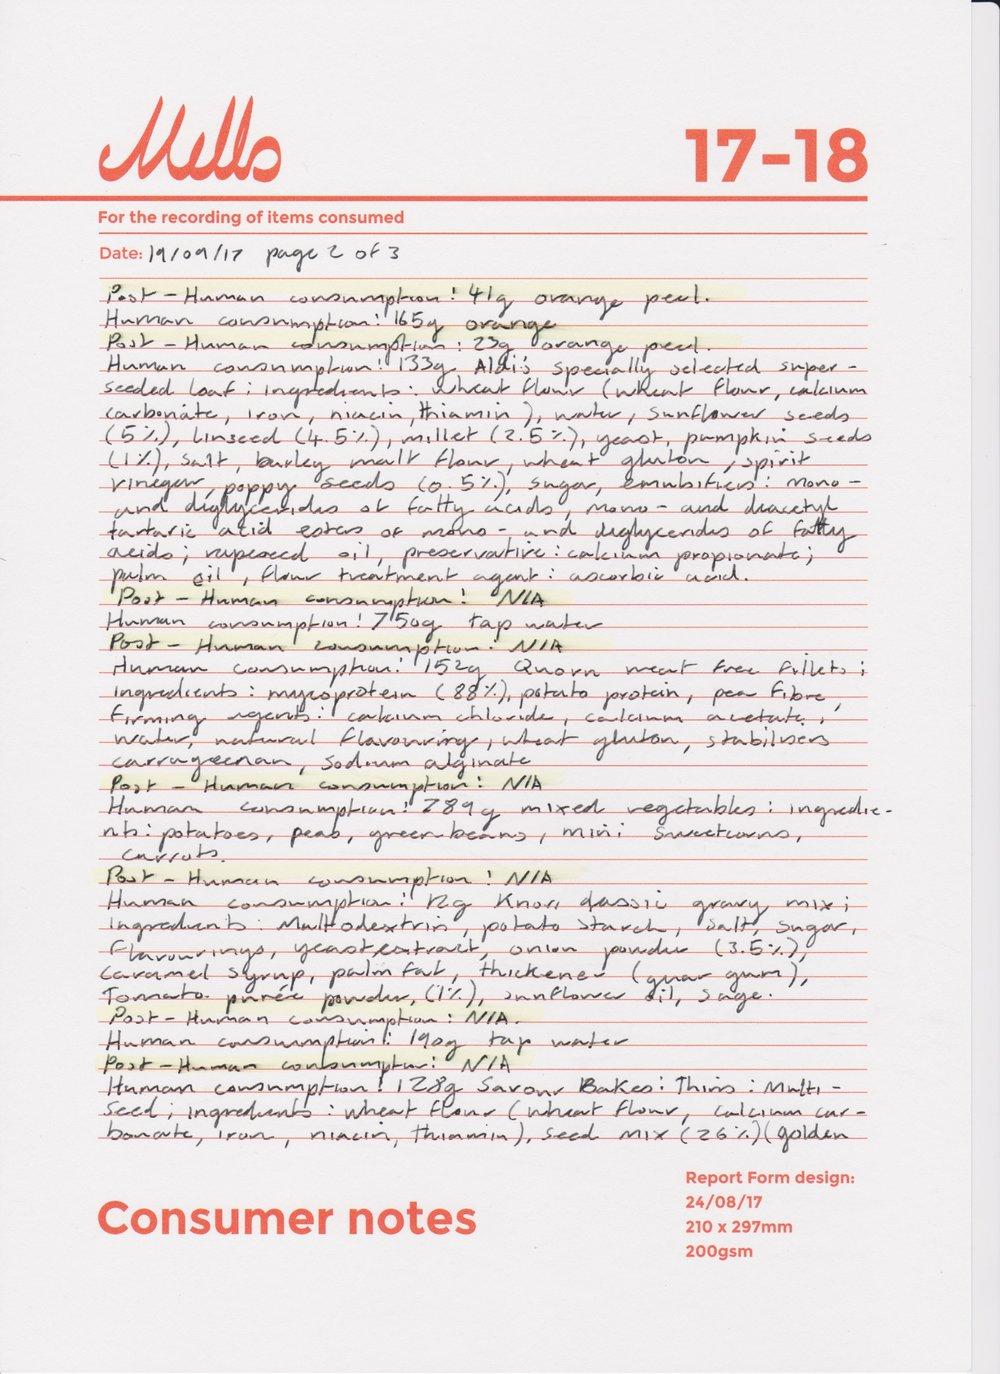 Steven Mills Consumer notes 190917 pg2 of 3.jpeg